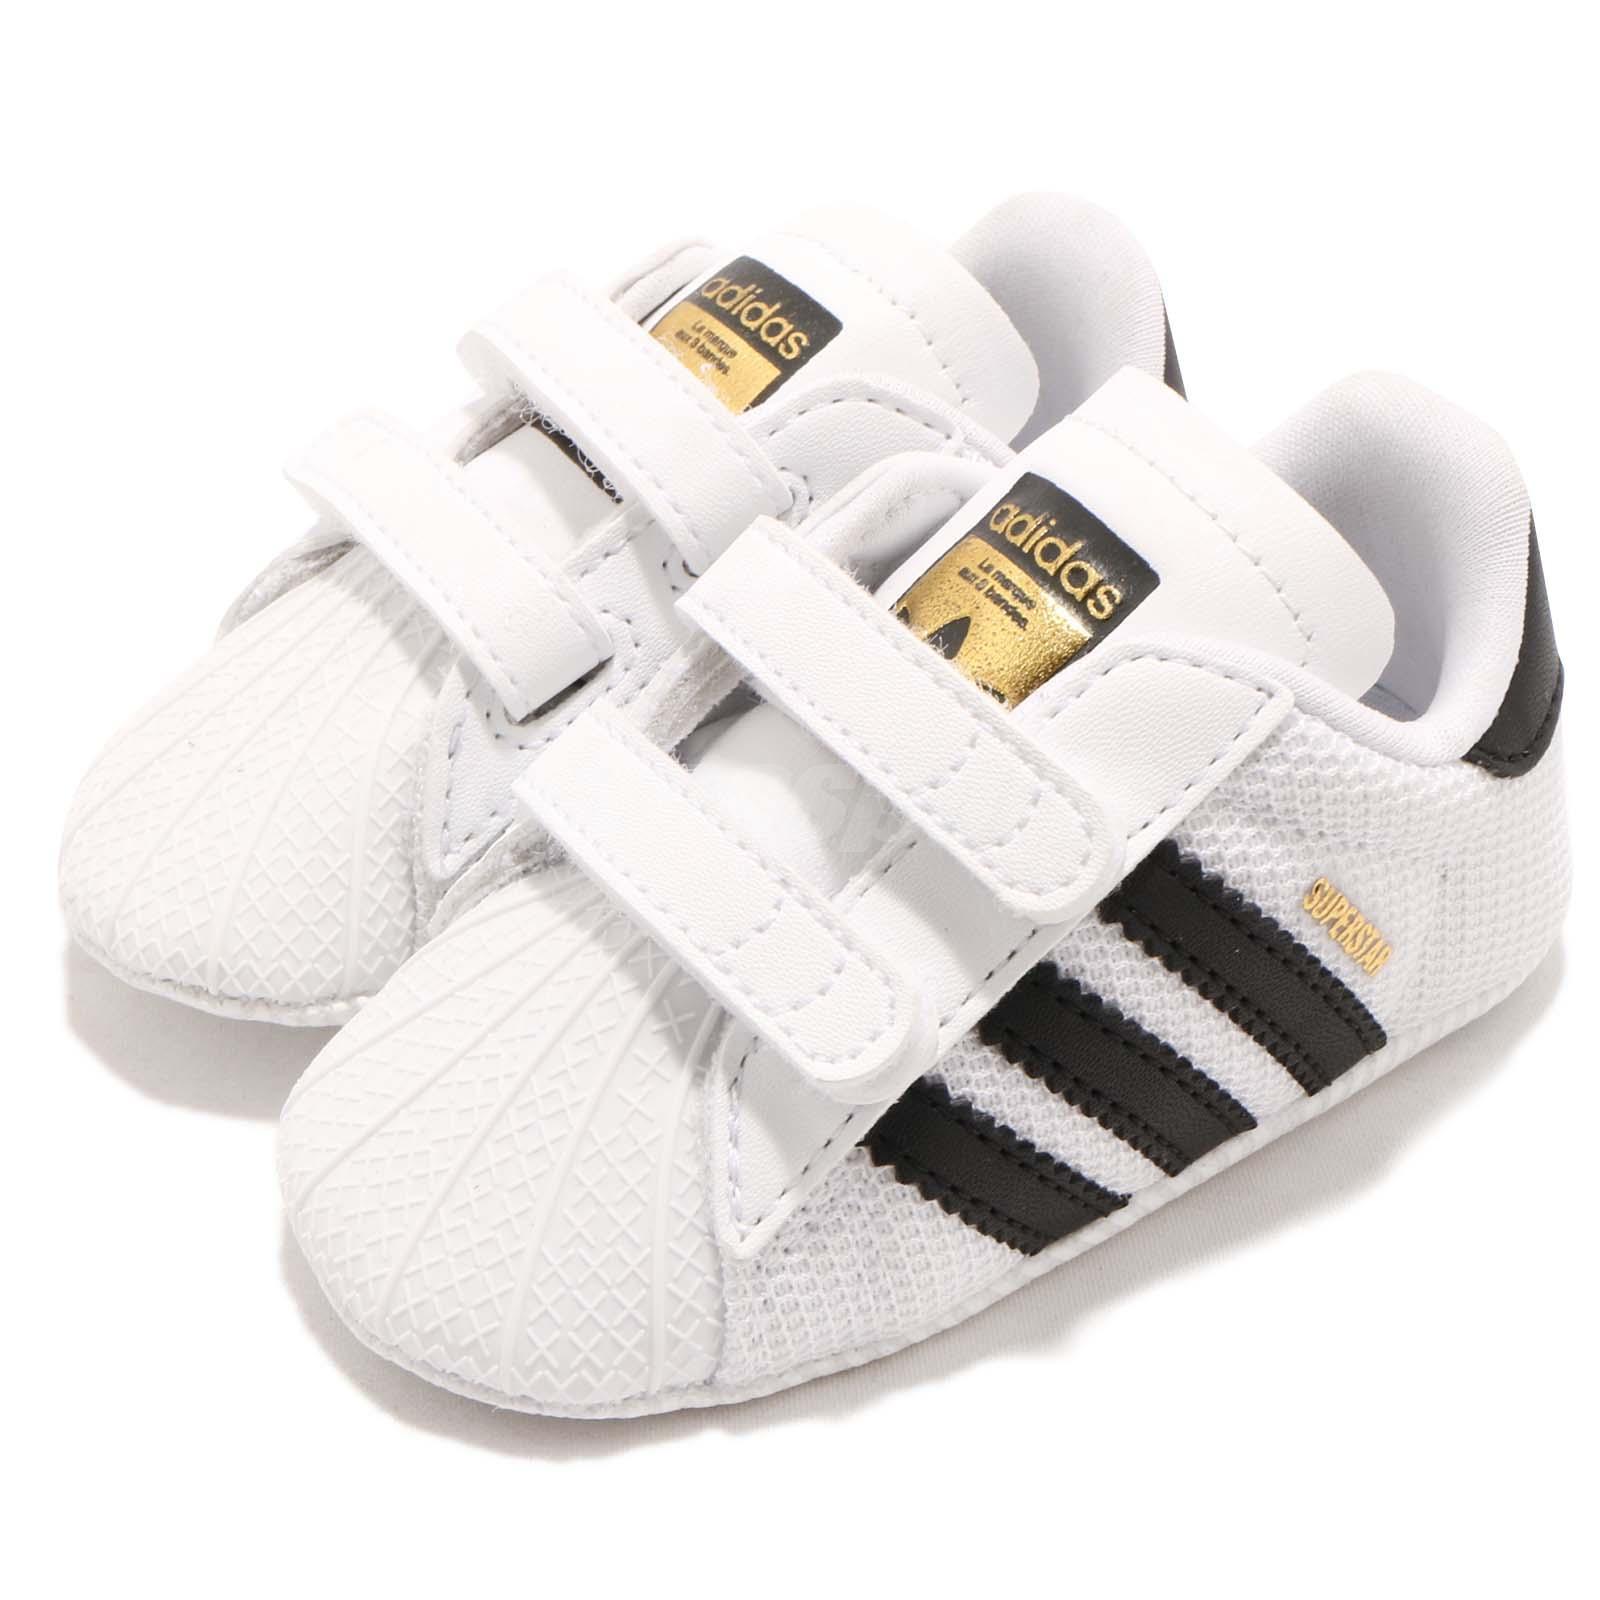 33f81c5802d Details about adidas Originals Superstar CRIB White Black TD Toddler Infant  Baby Shoes S79916